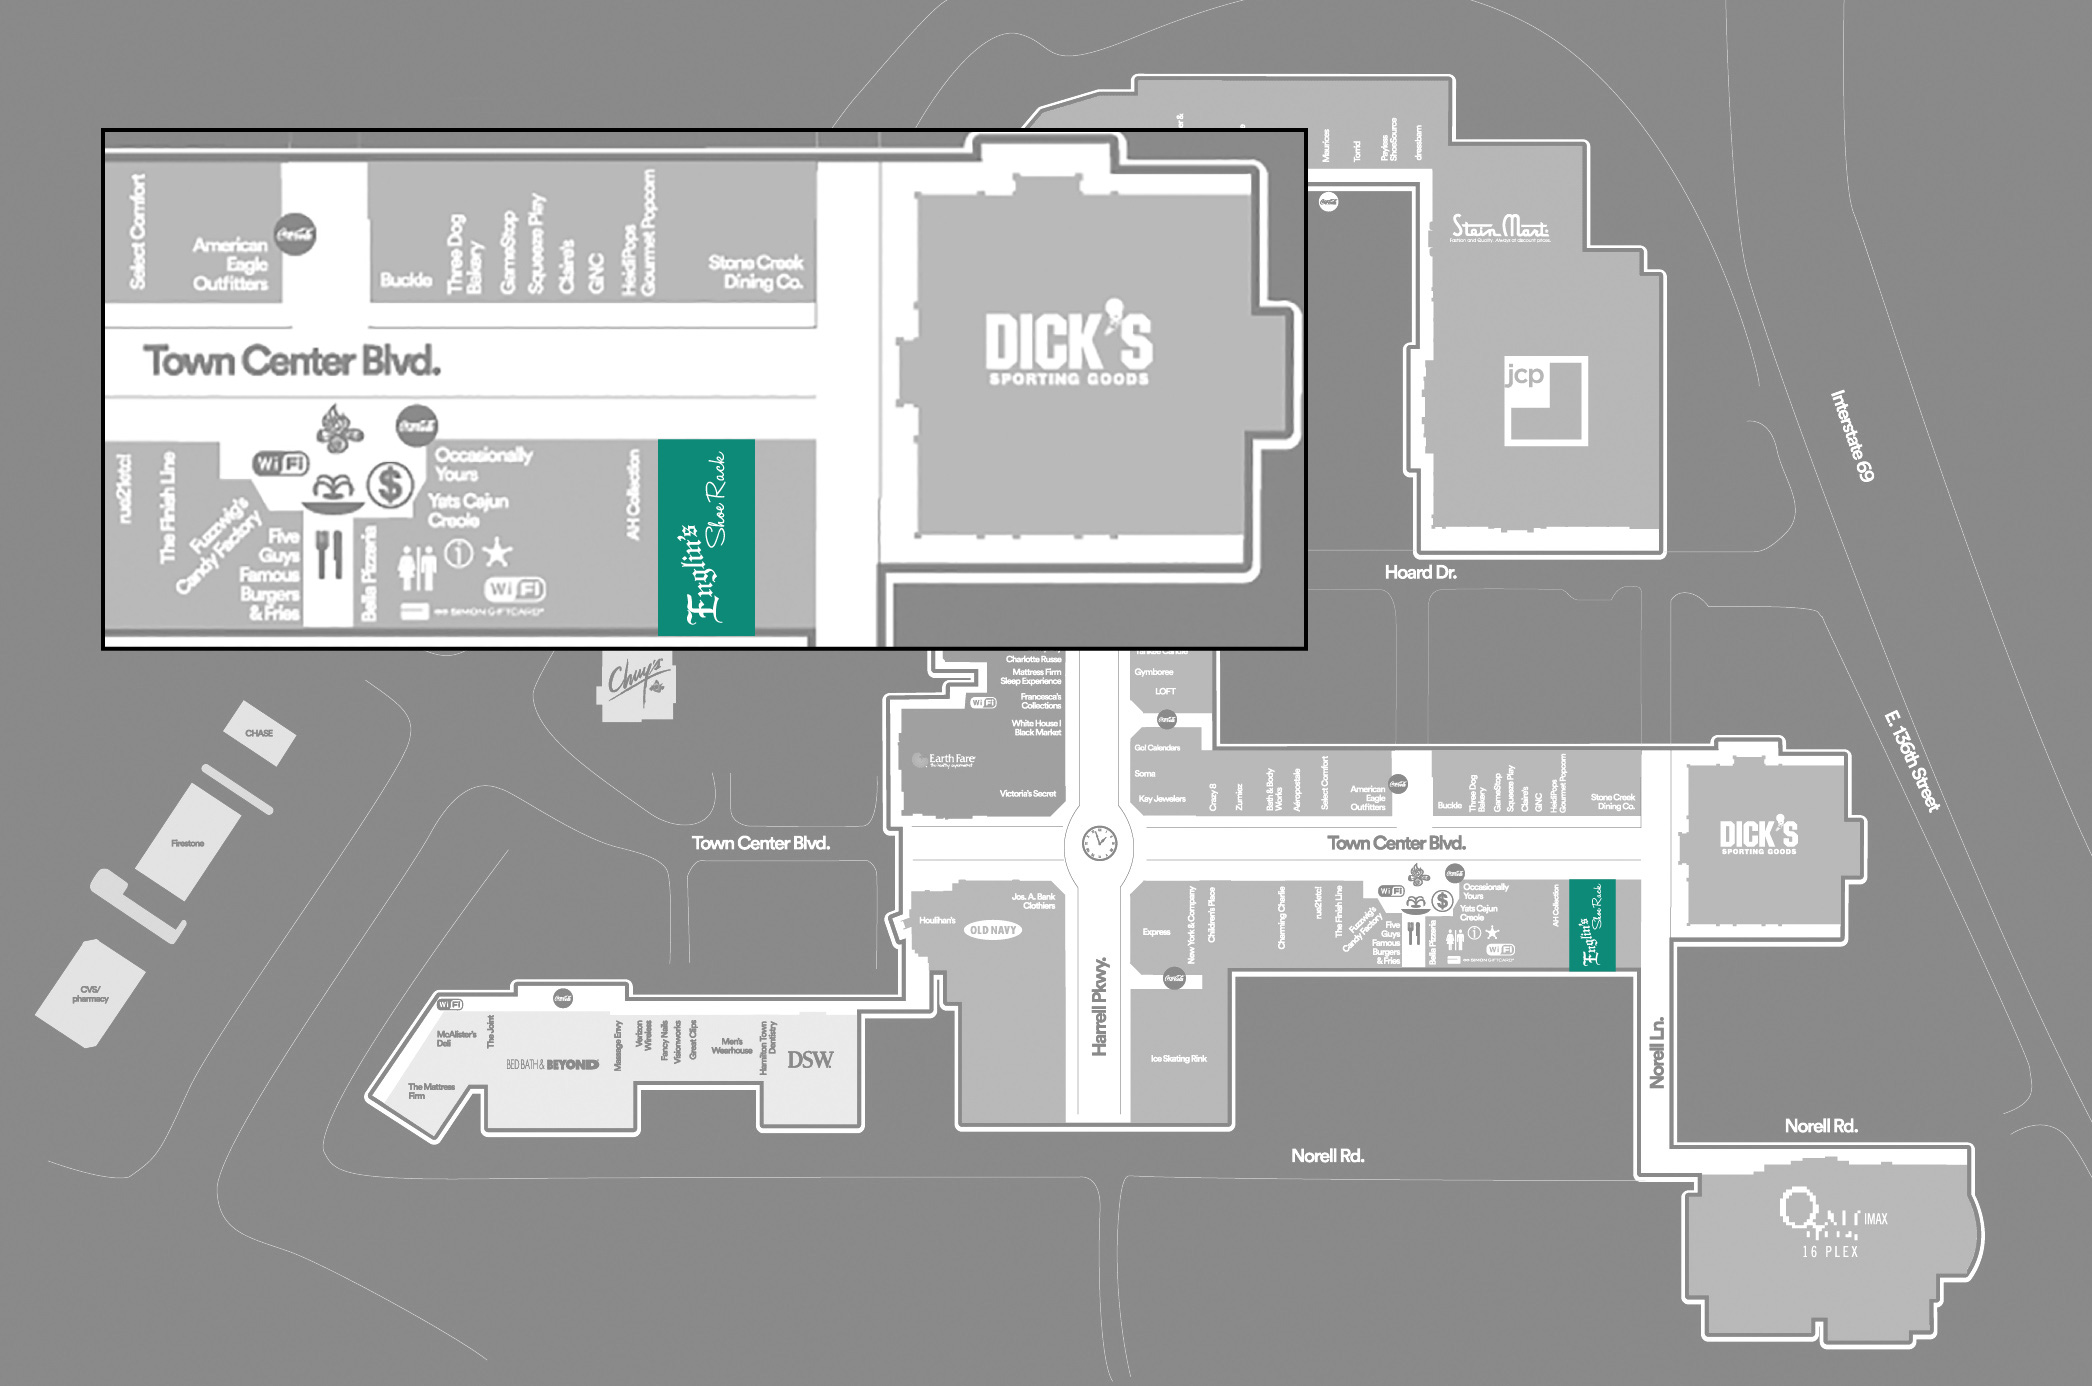 englins-shoe-rack-mall-map-location-1.2.jpg